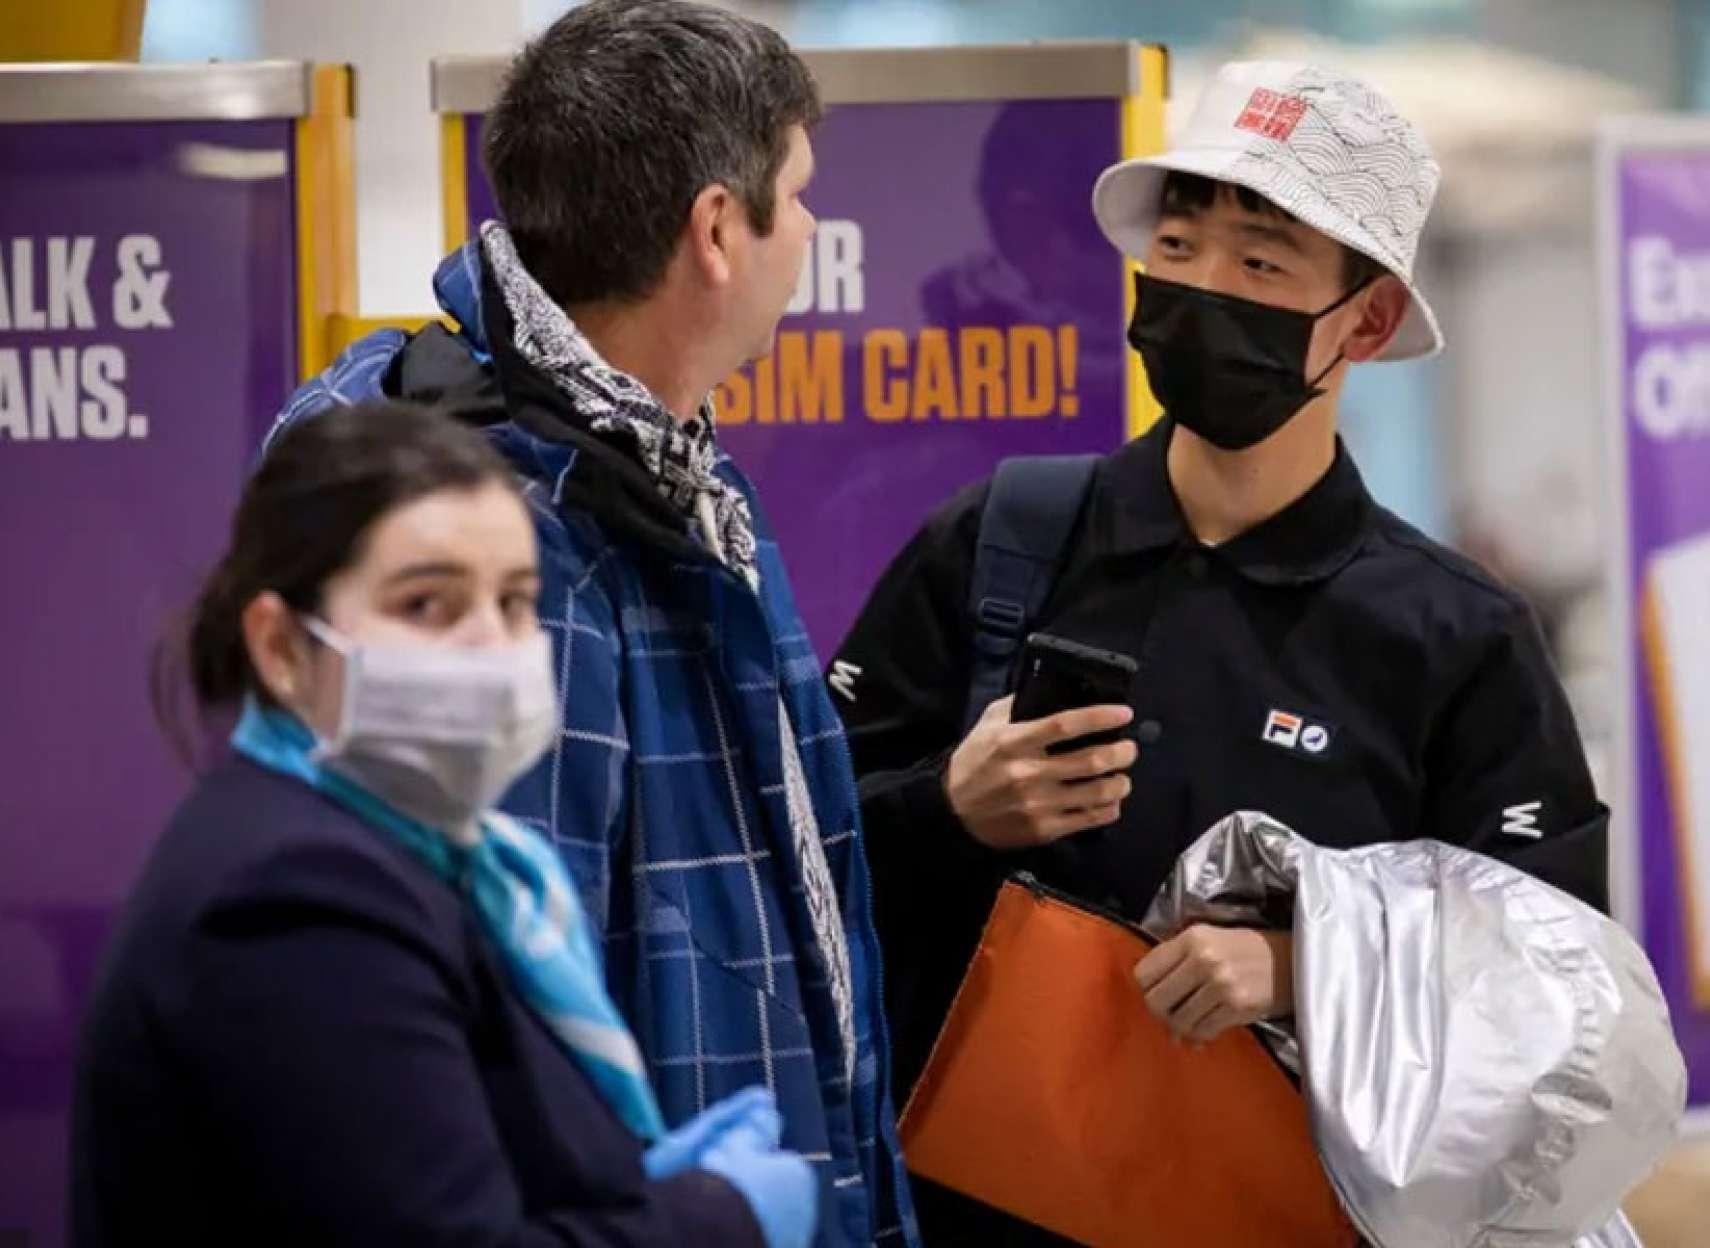 اخبار-کانادا-ثبت-دومین-بیمار-ویروس-کرونا-در-تورنتو-ماسک-بزنیم-یا-نزنیم